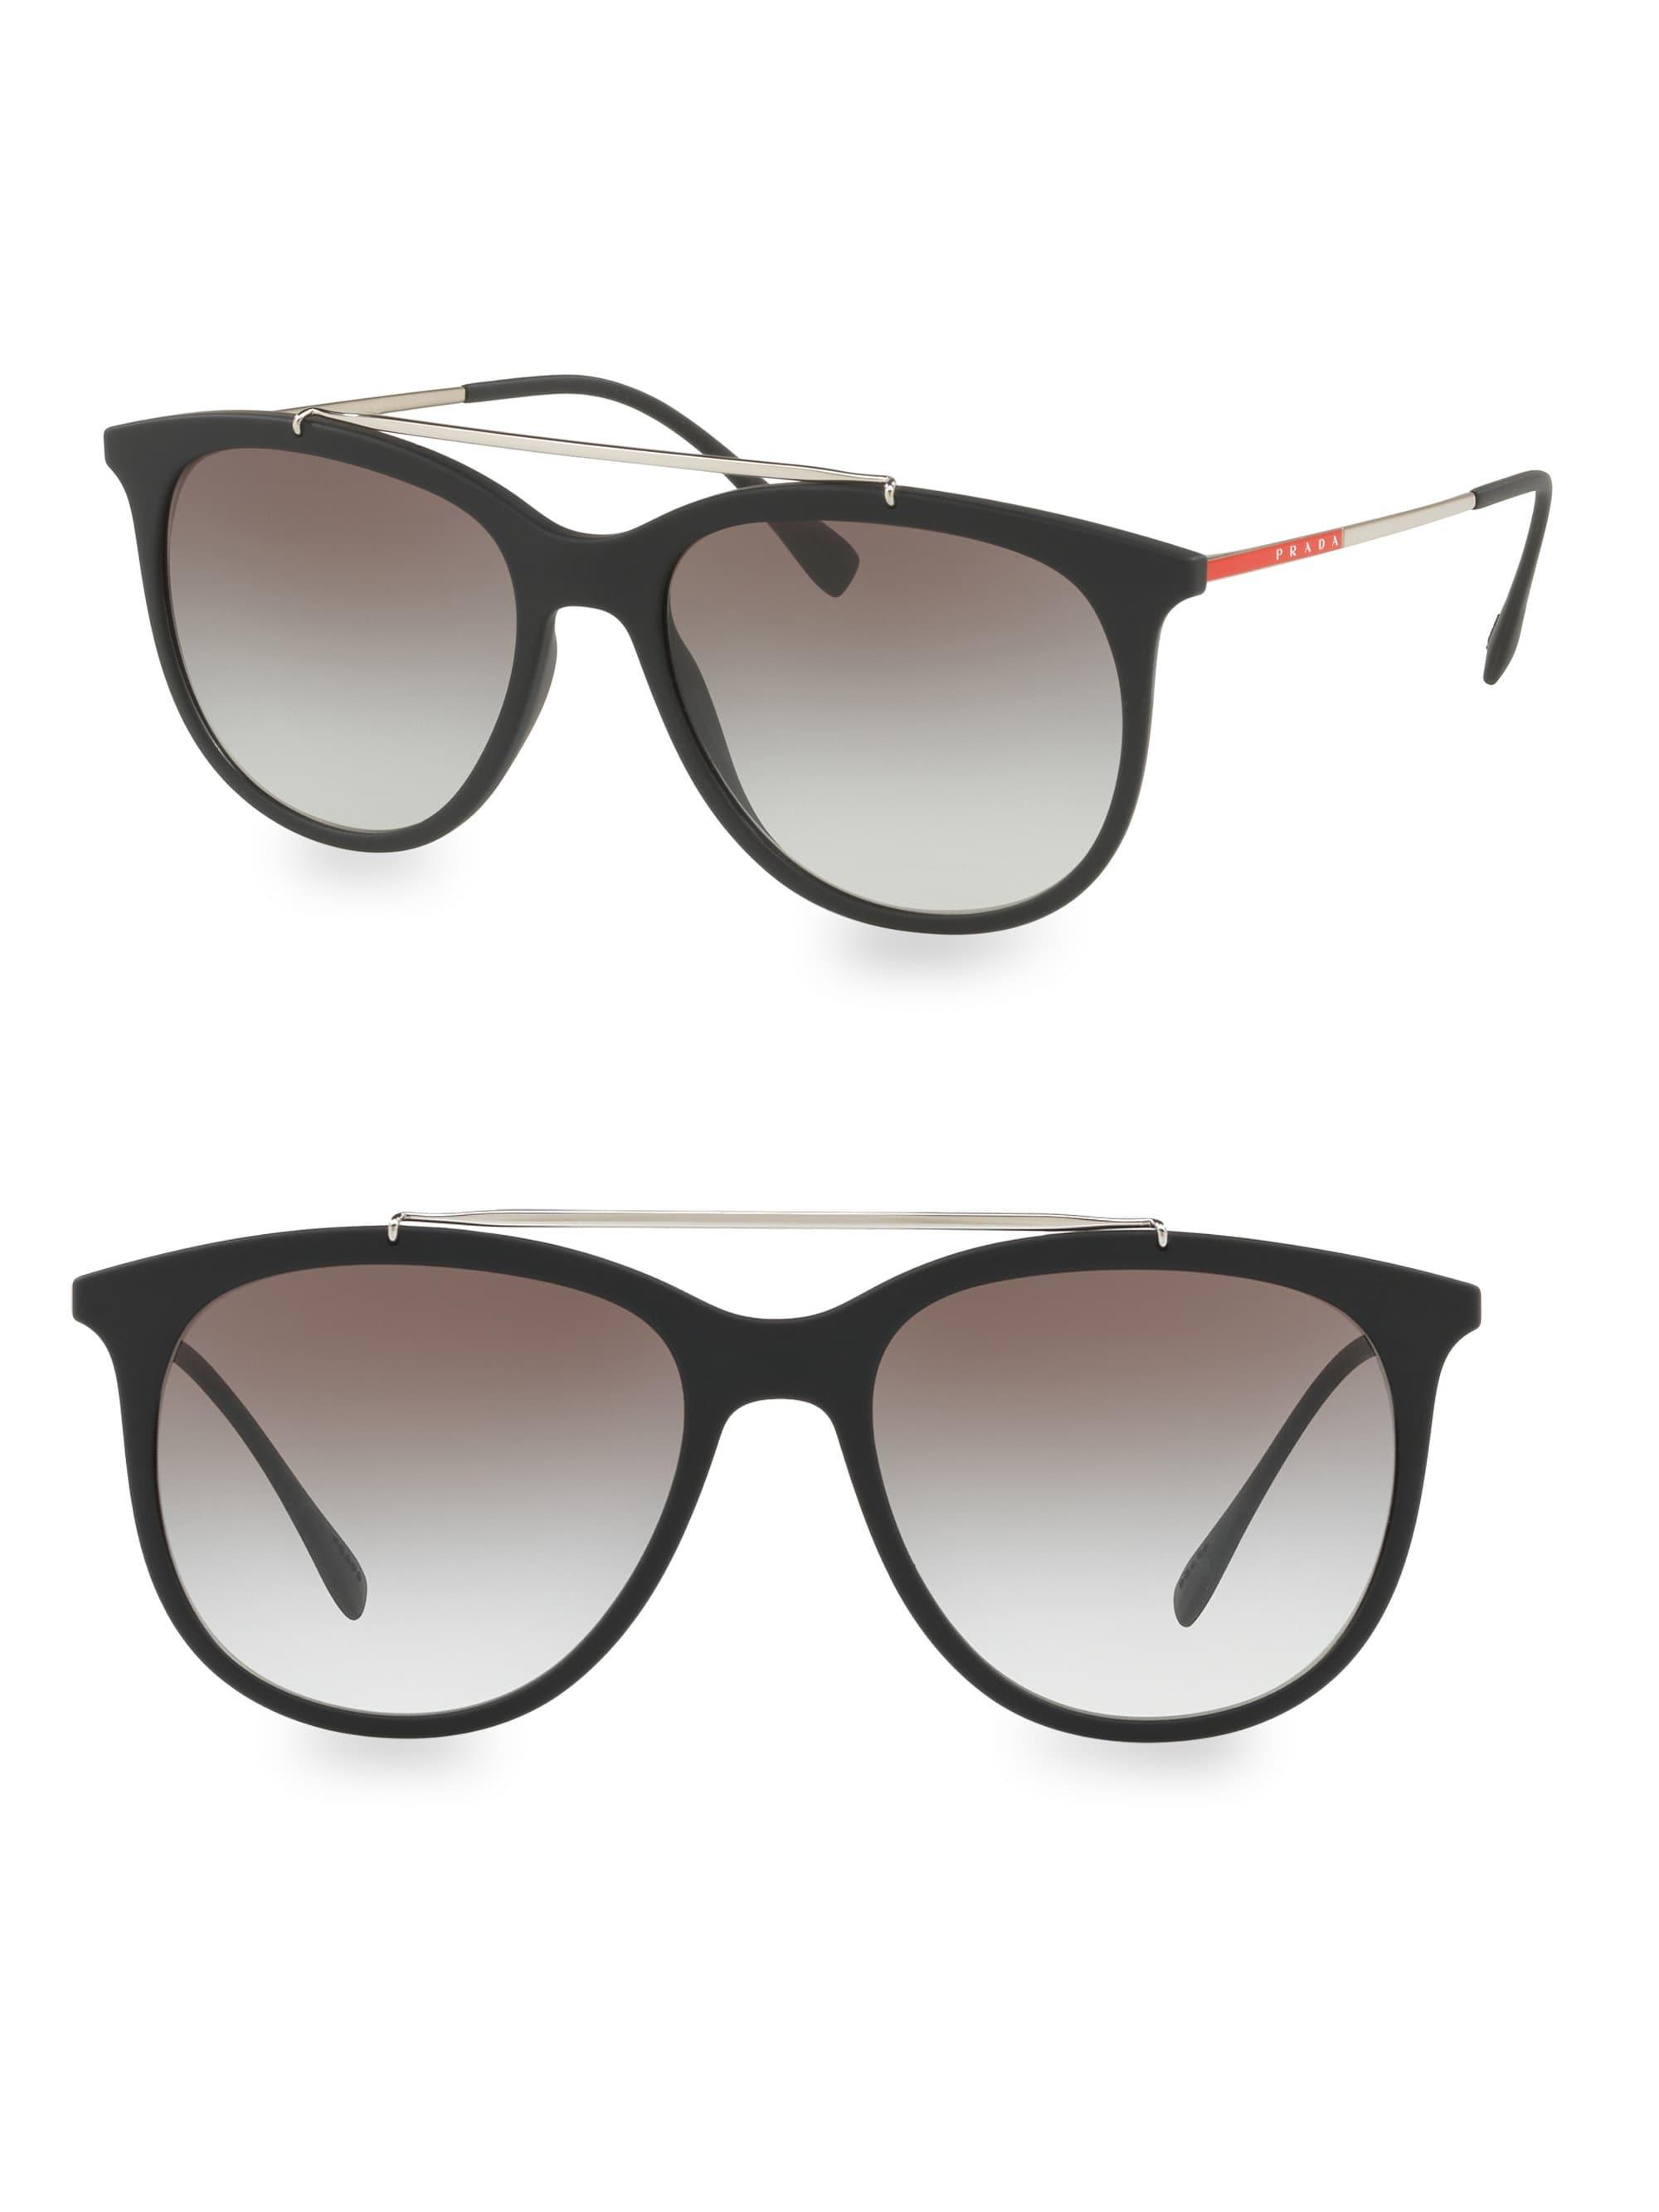 6e0f4847b34cd Prada Linea Rossa 54mm Gradient Matte Black Sunglasses in Black for ...